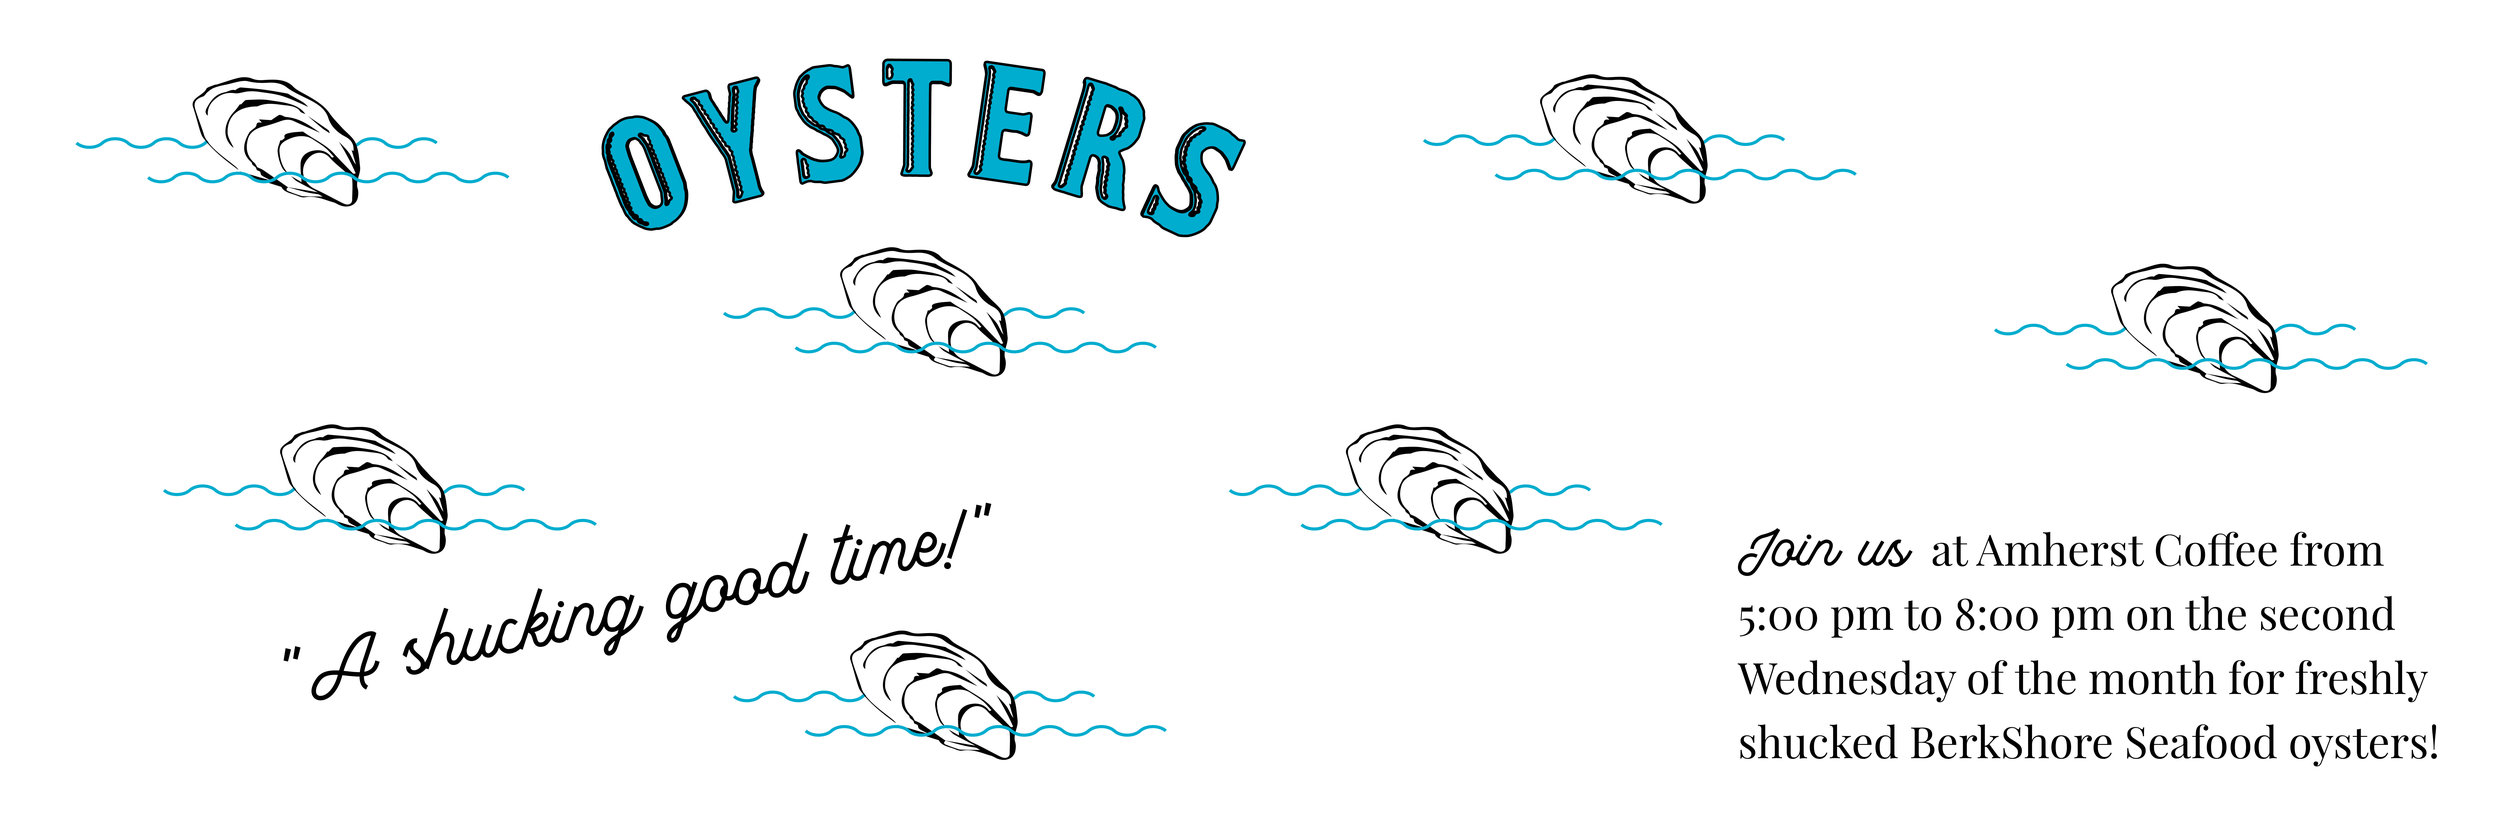 oyster web.jpg